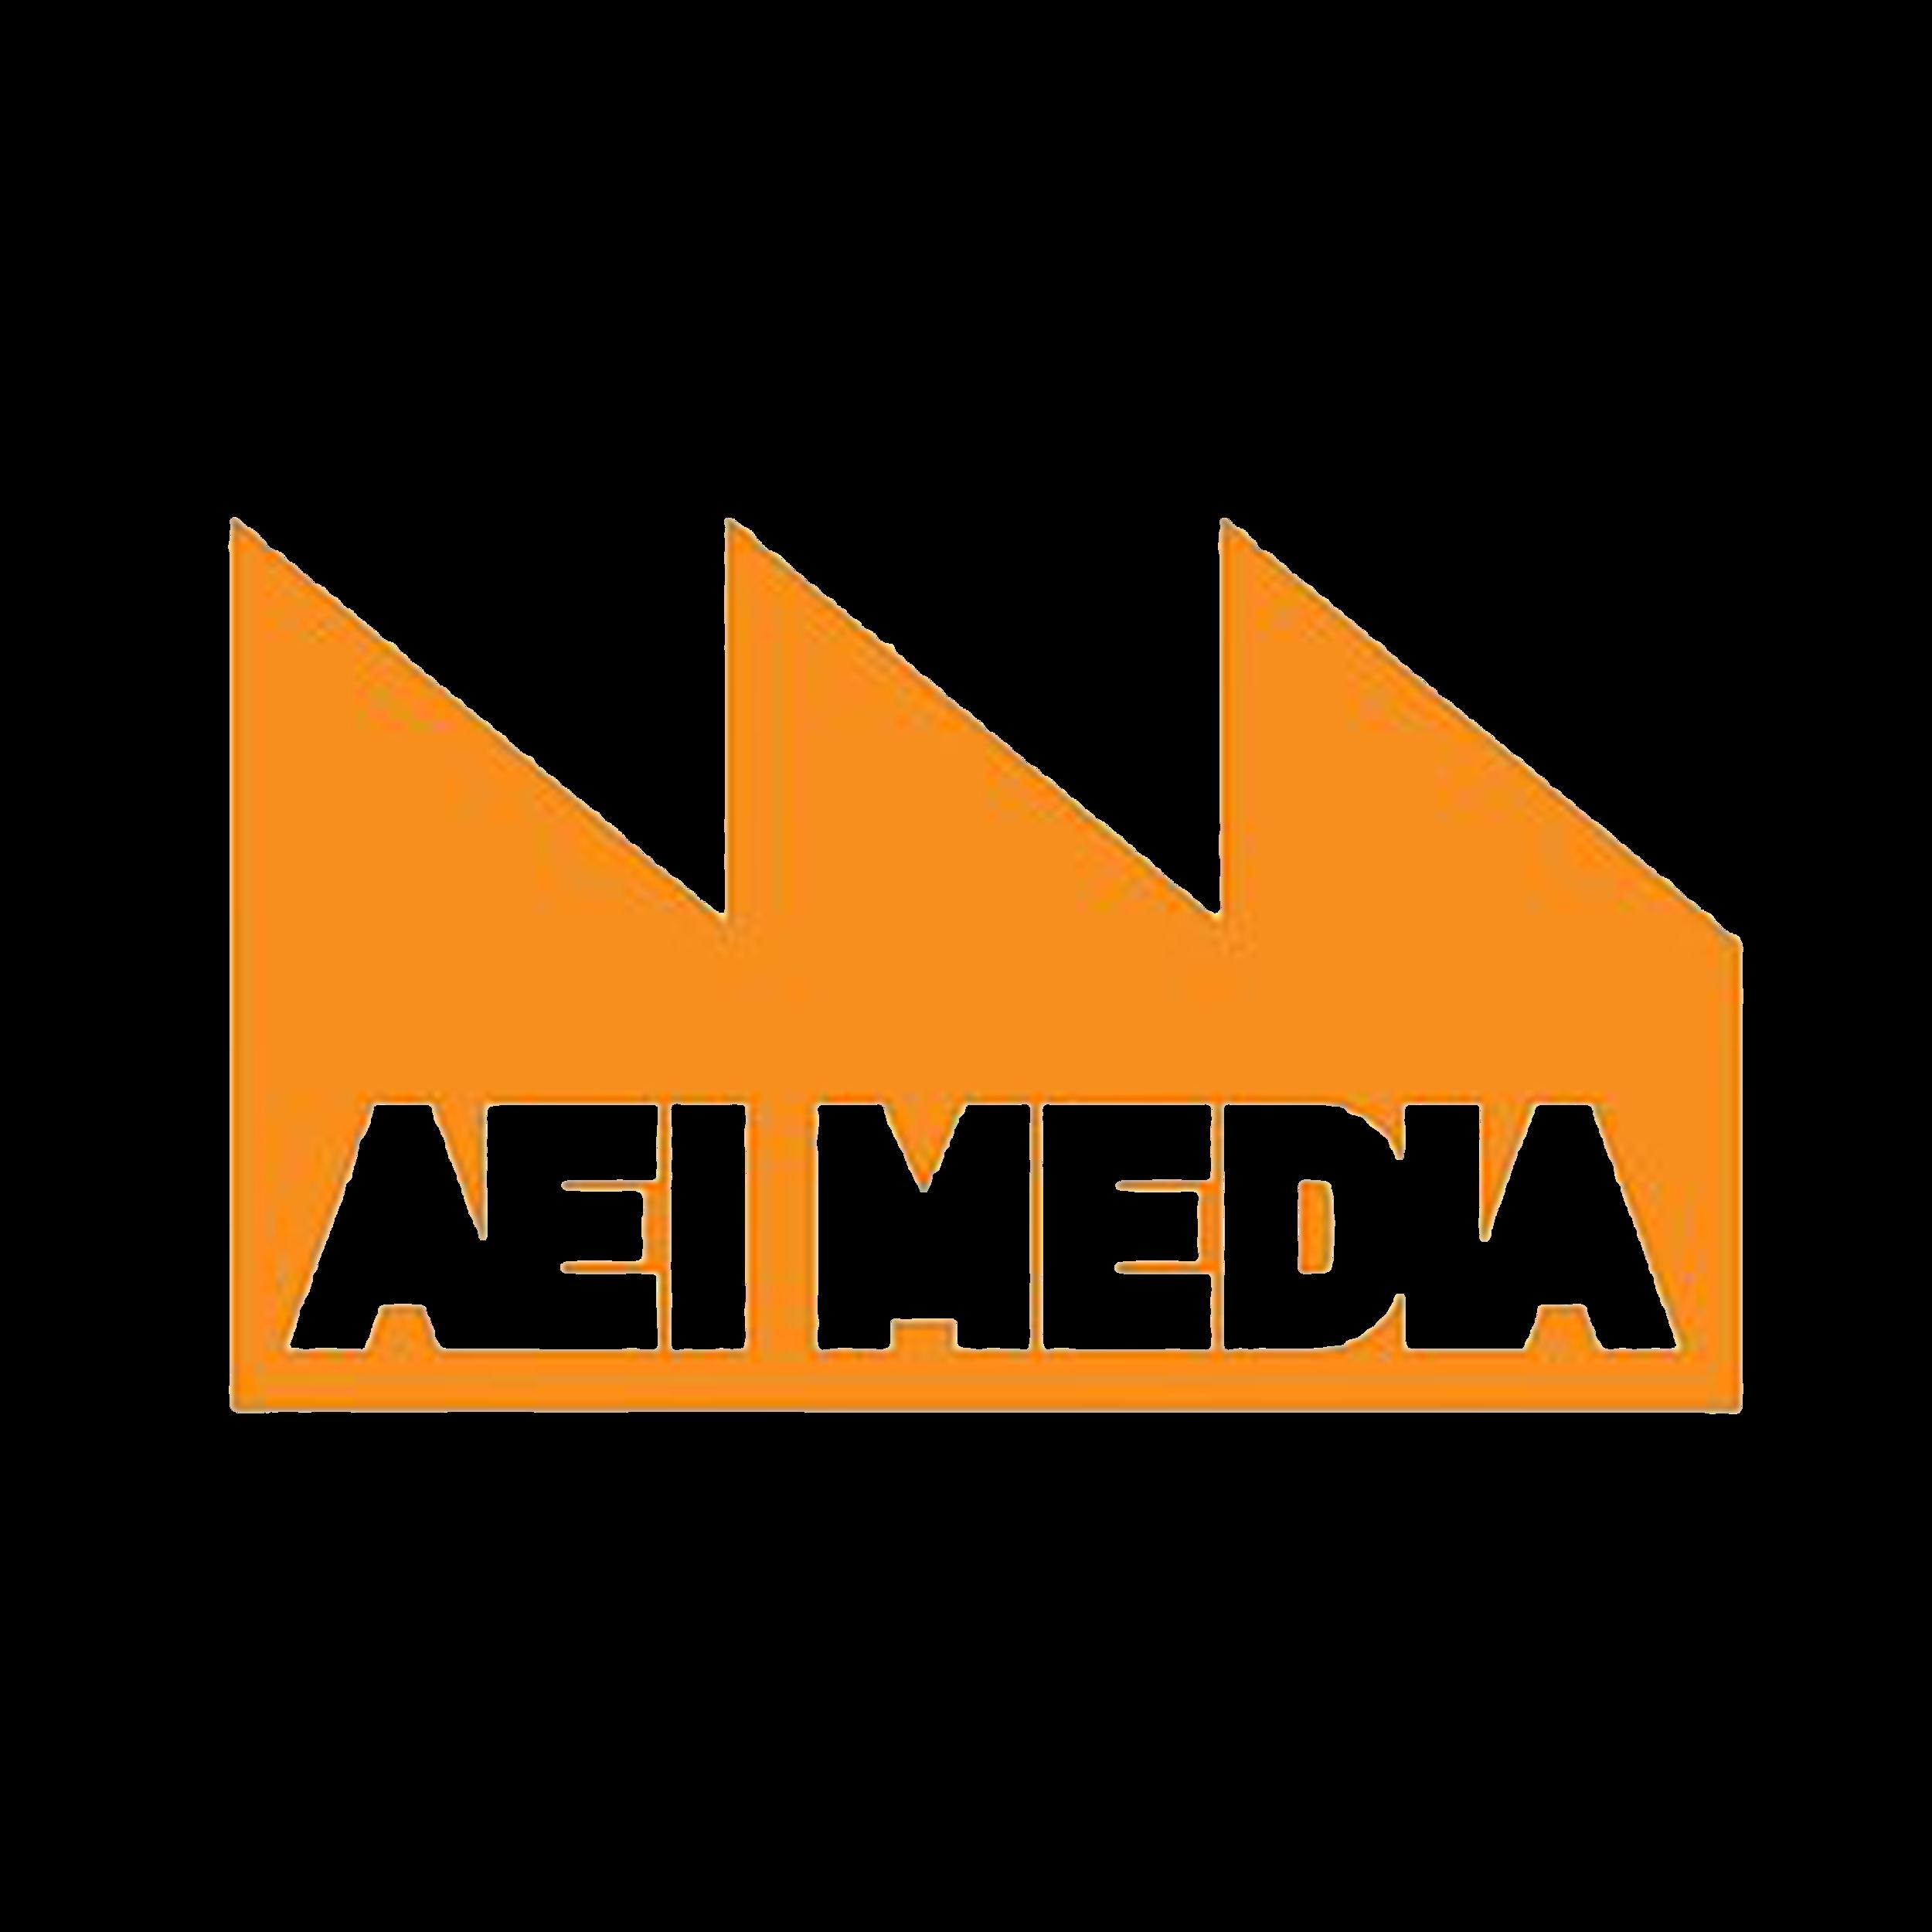 AEI Media Square.png